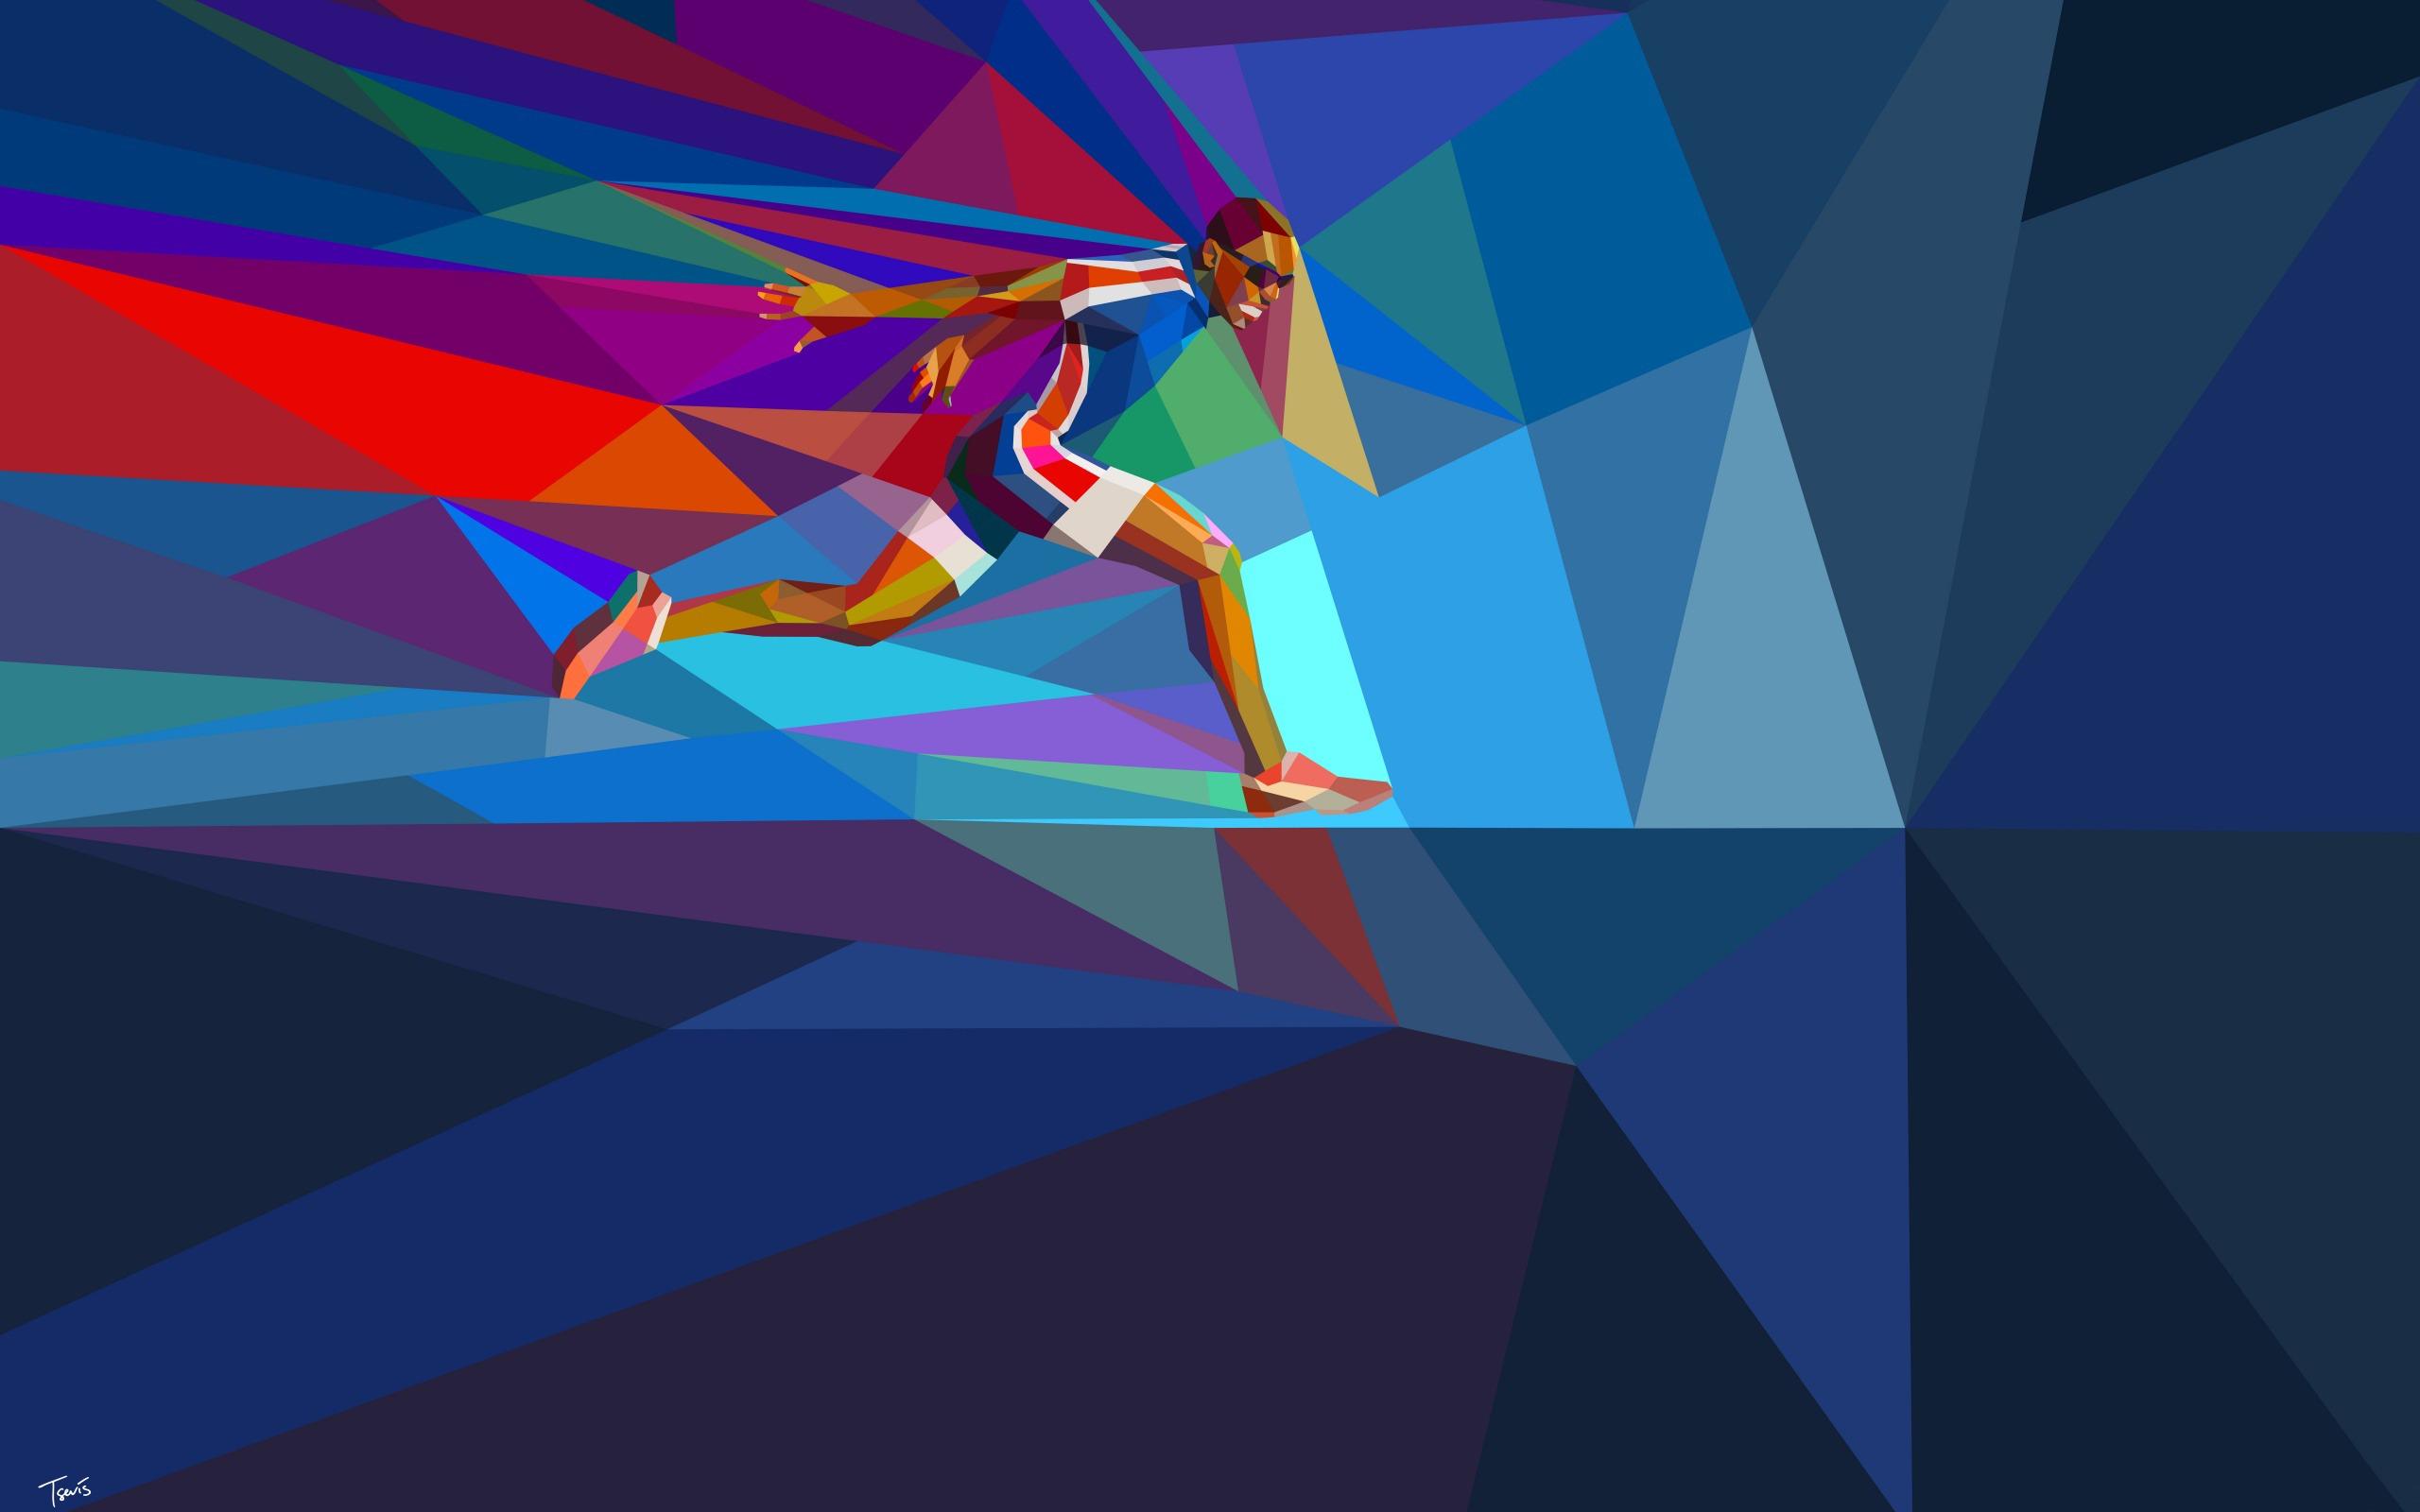 Runner Rio 2016 Juegos Olímpicos Hd Vector Wallpaper Avance